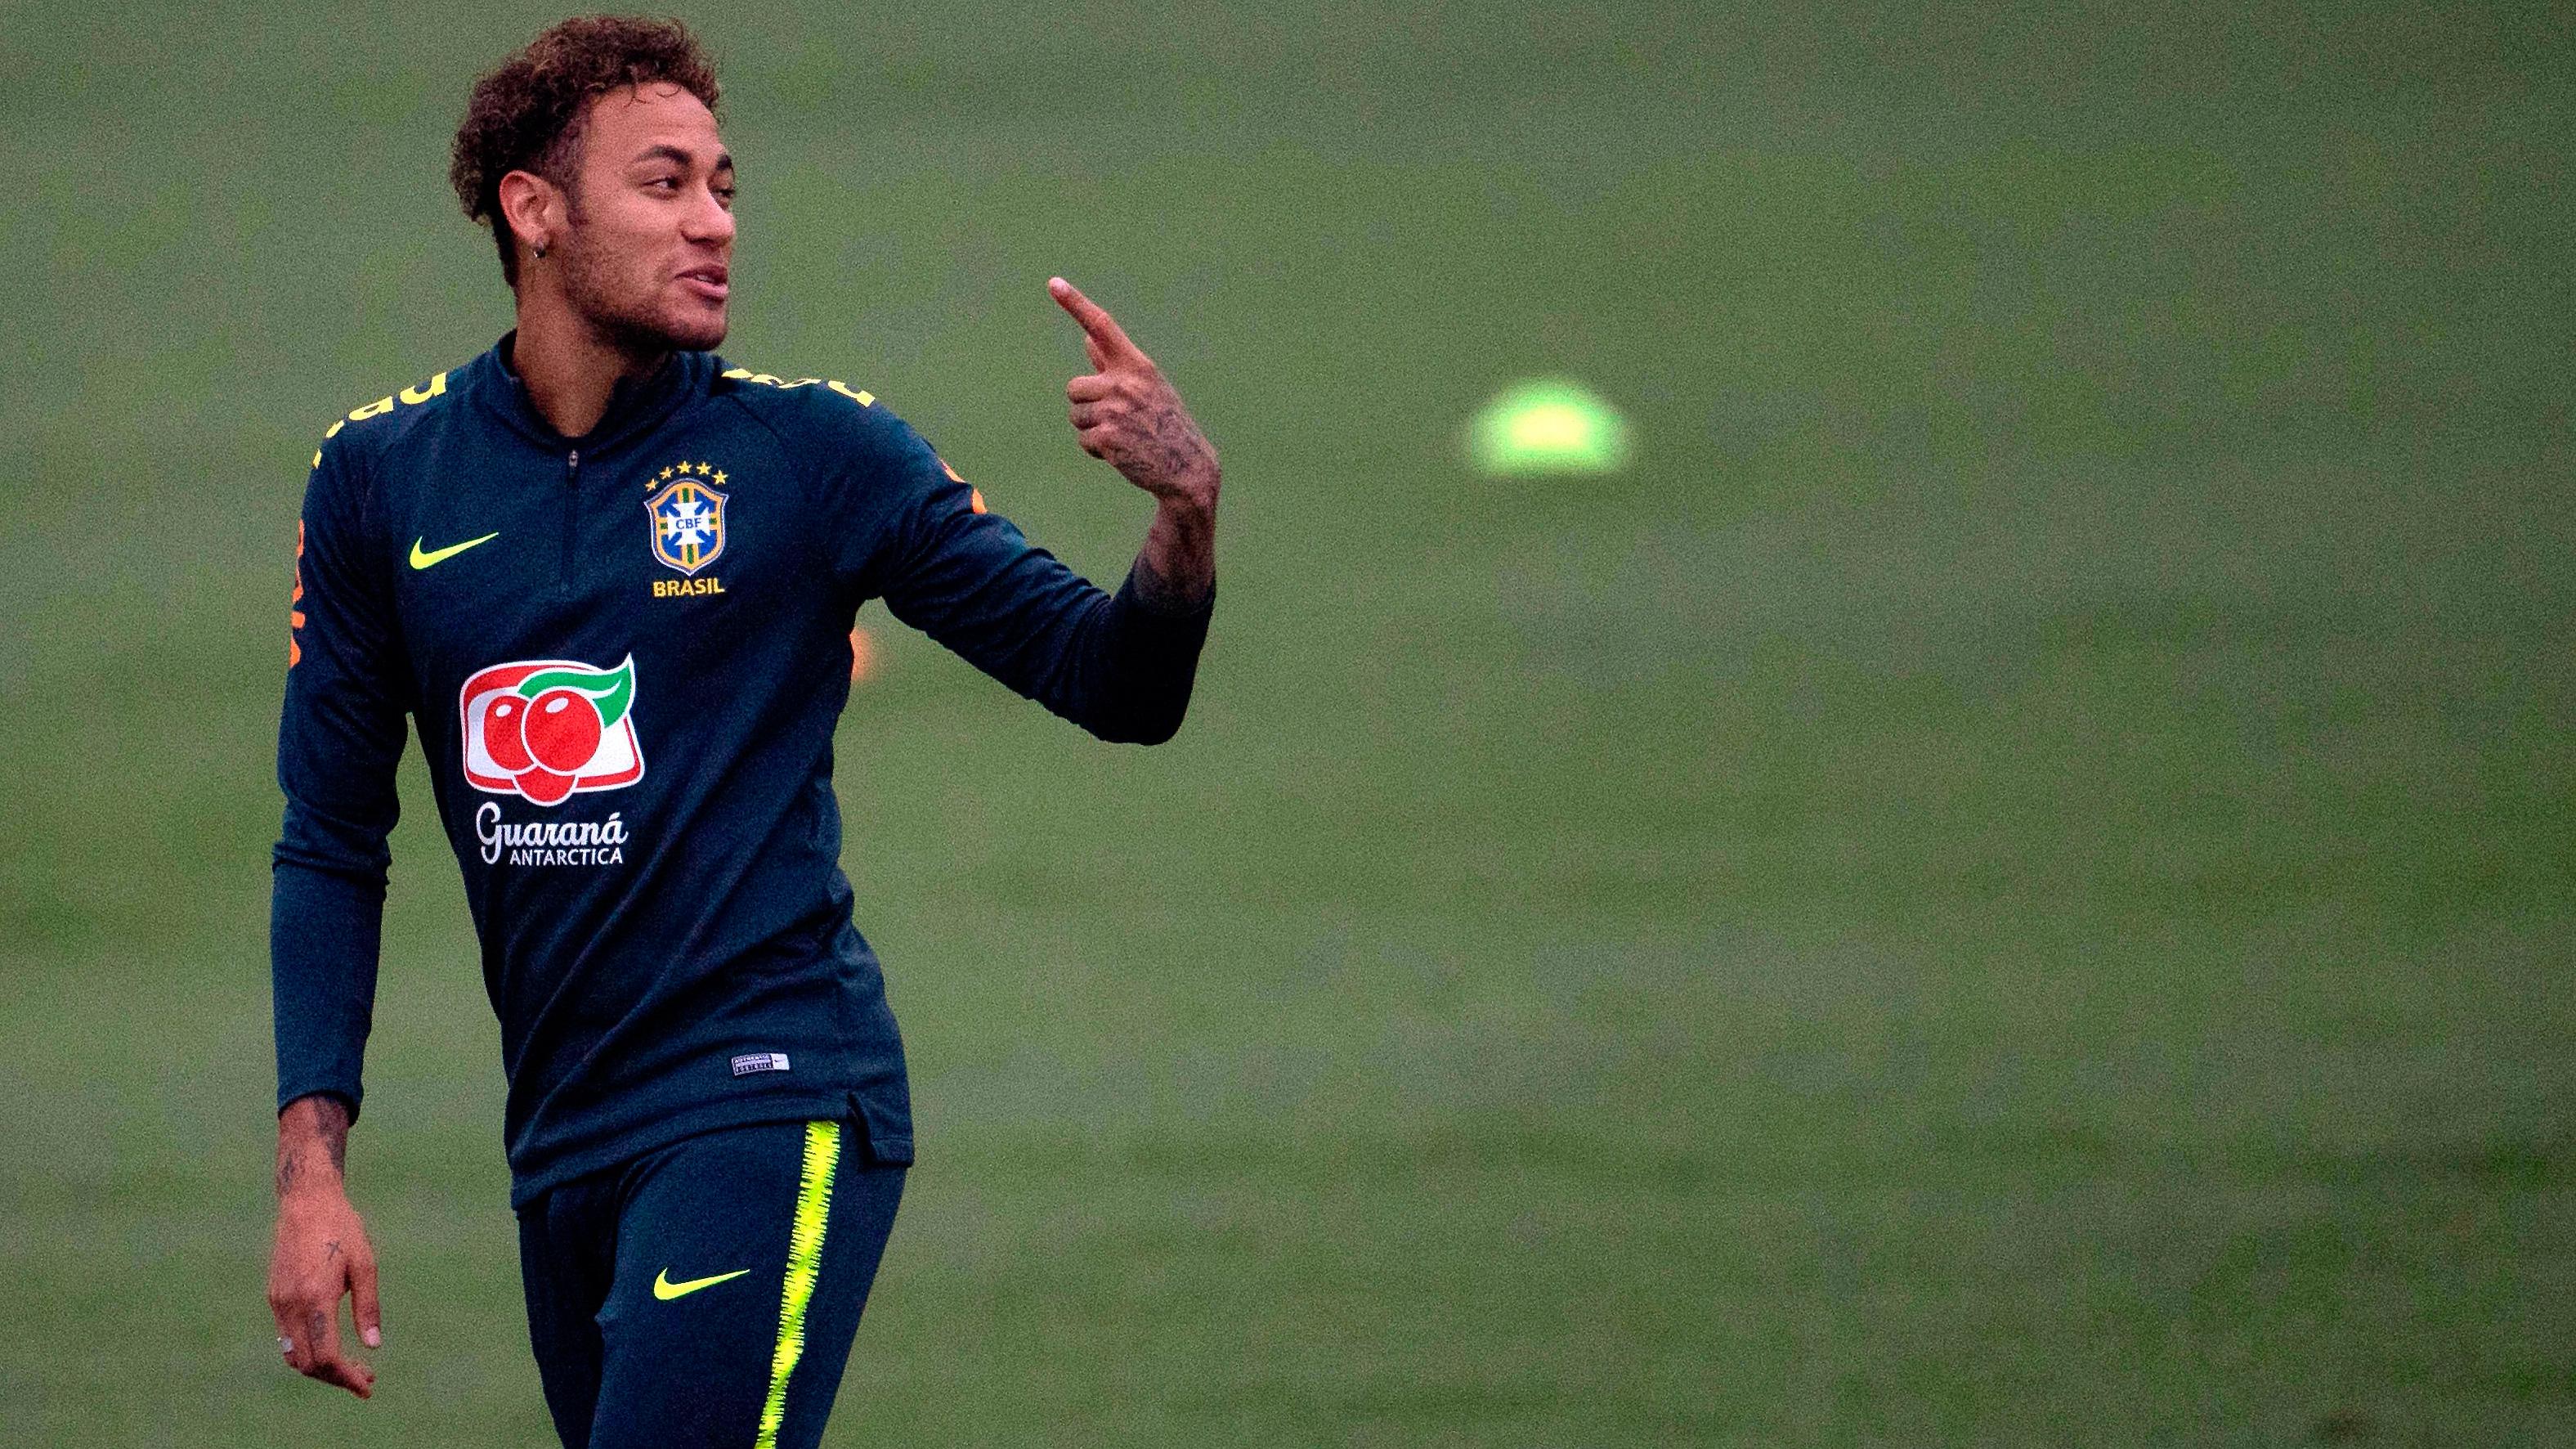 Neymar ya se entrena con Brasil y Argentina se pone nostálgica